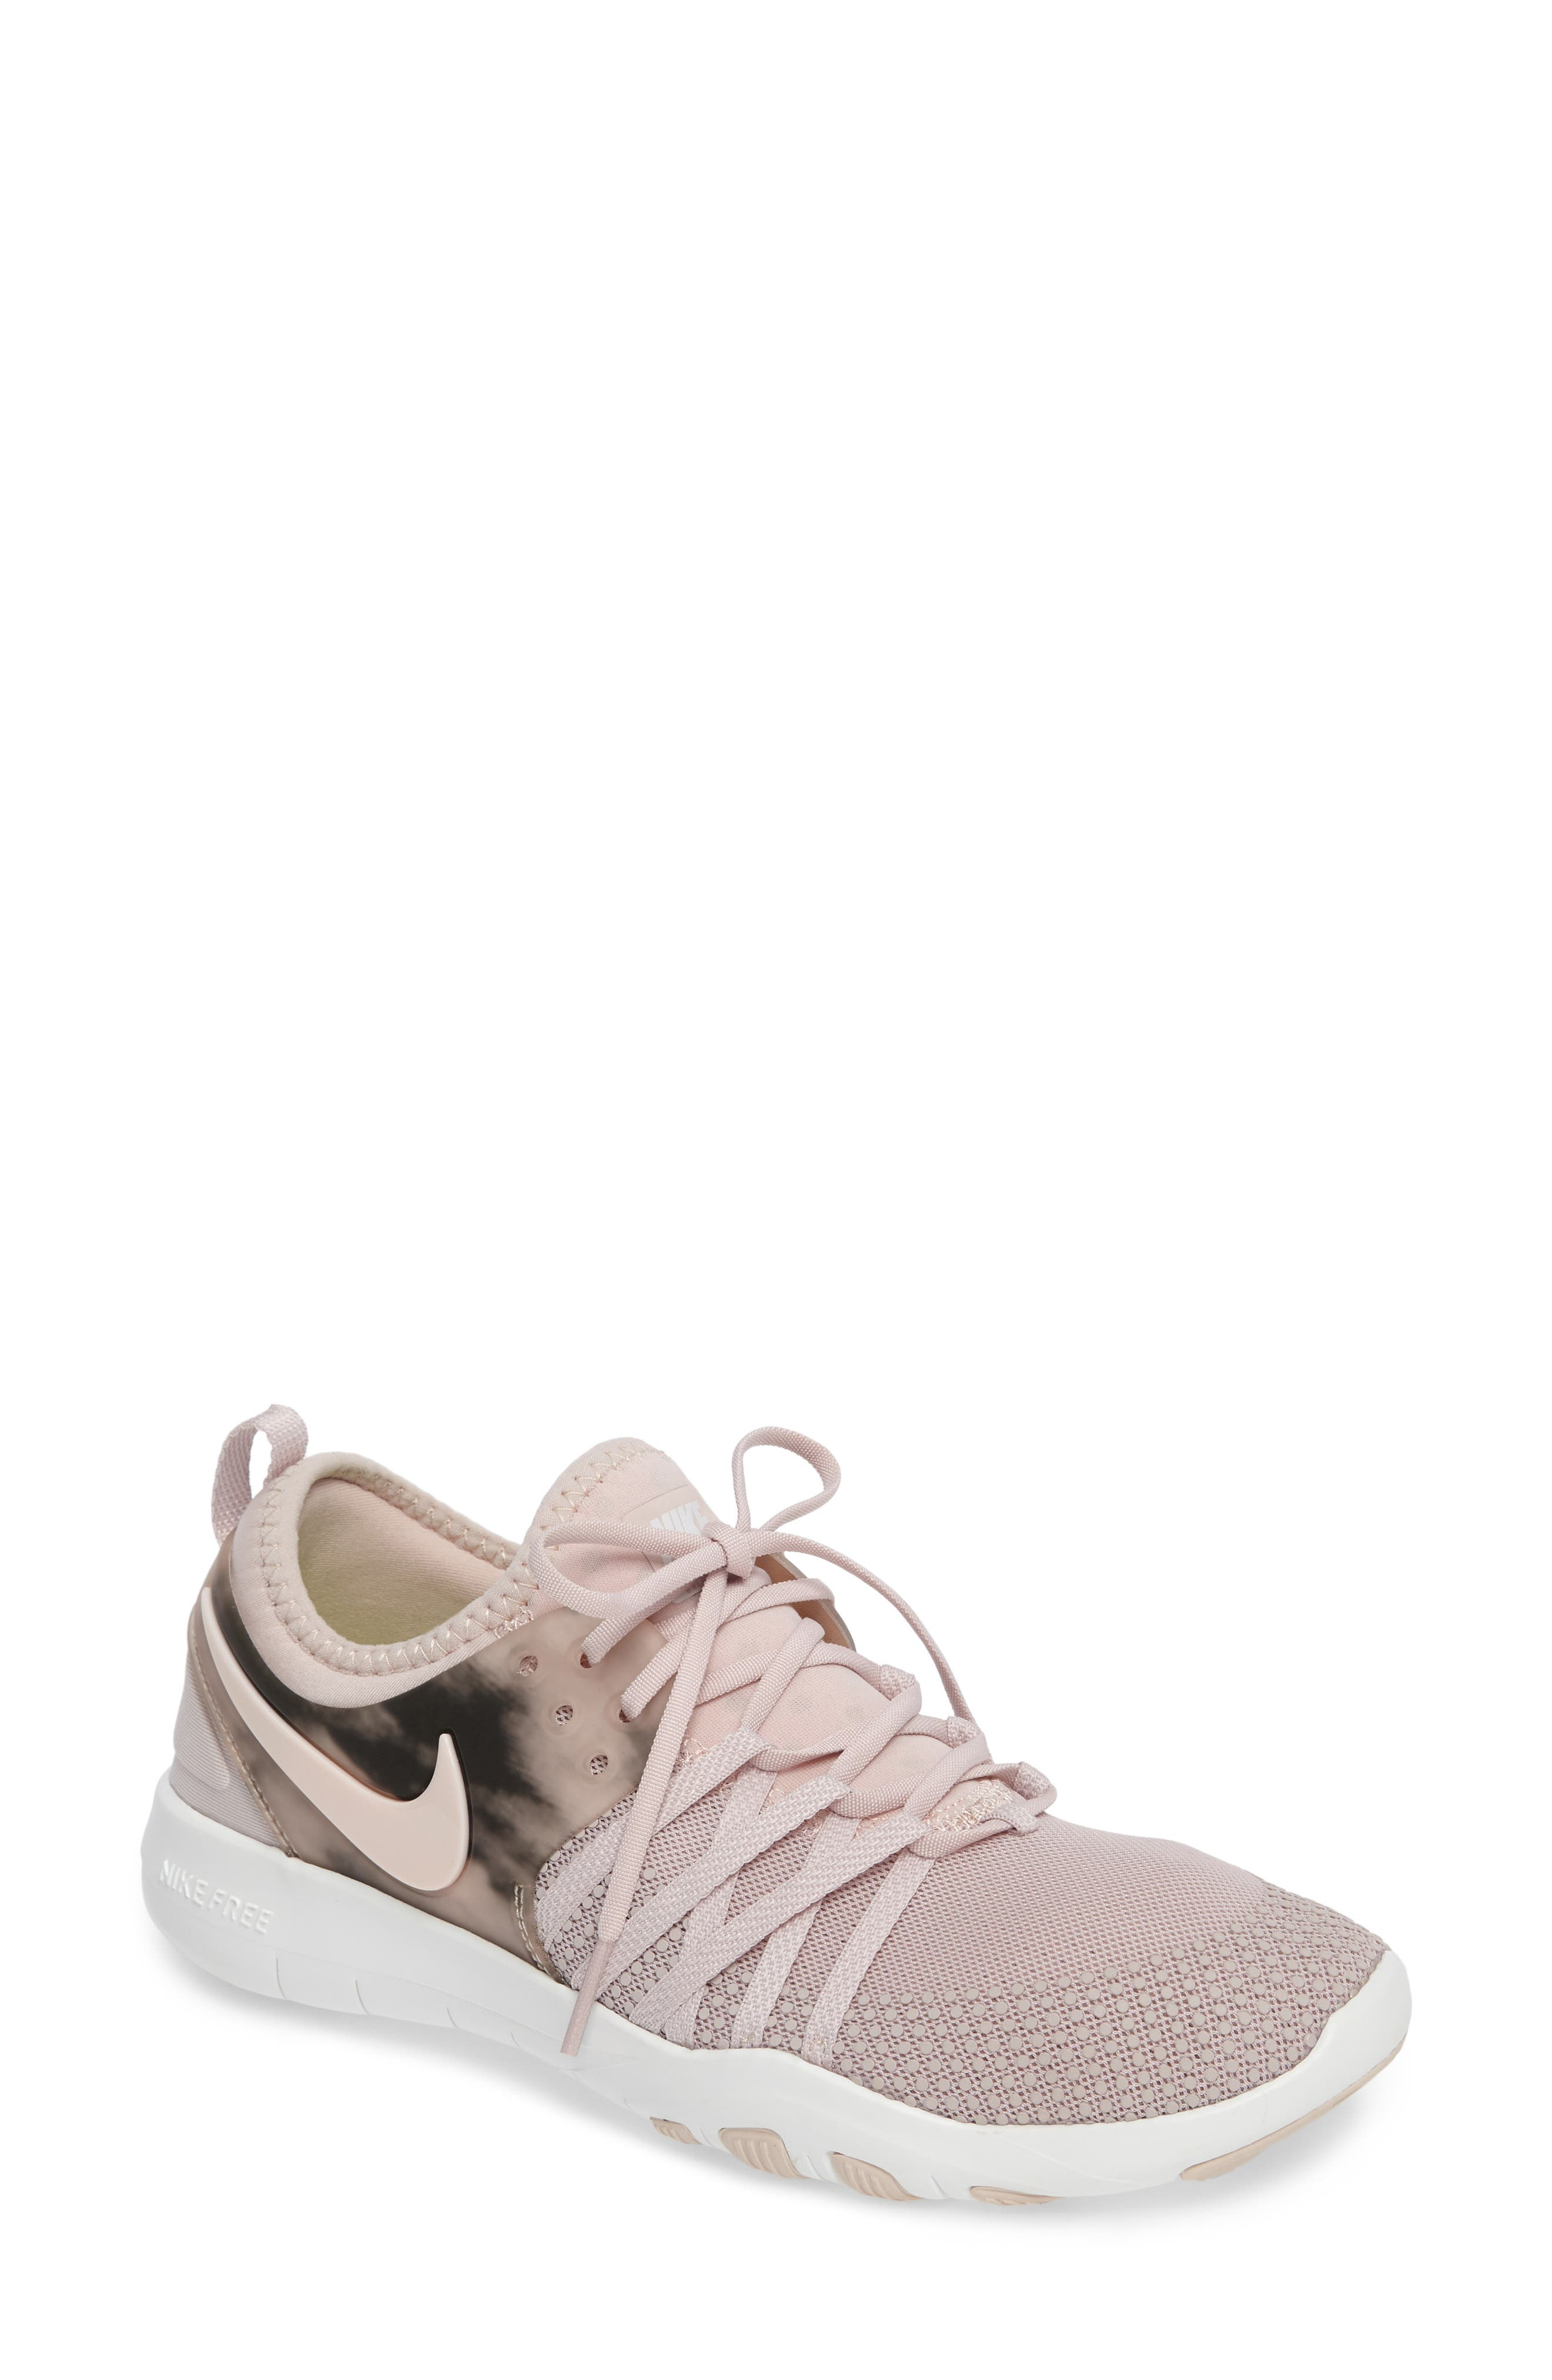 Main Image - Nike Free TR7 Amp Training Shoe (Women)